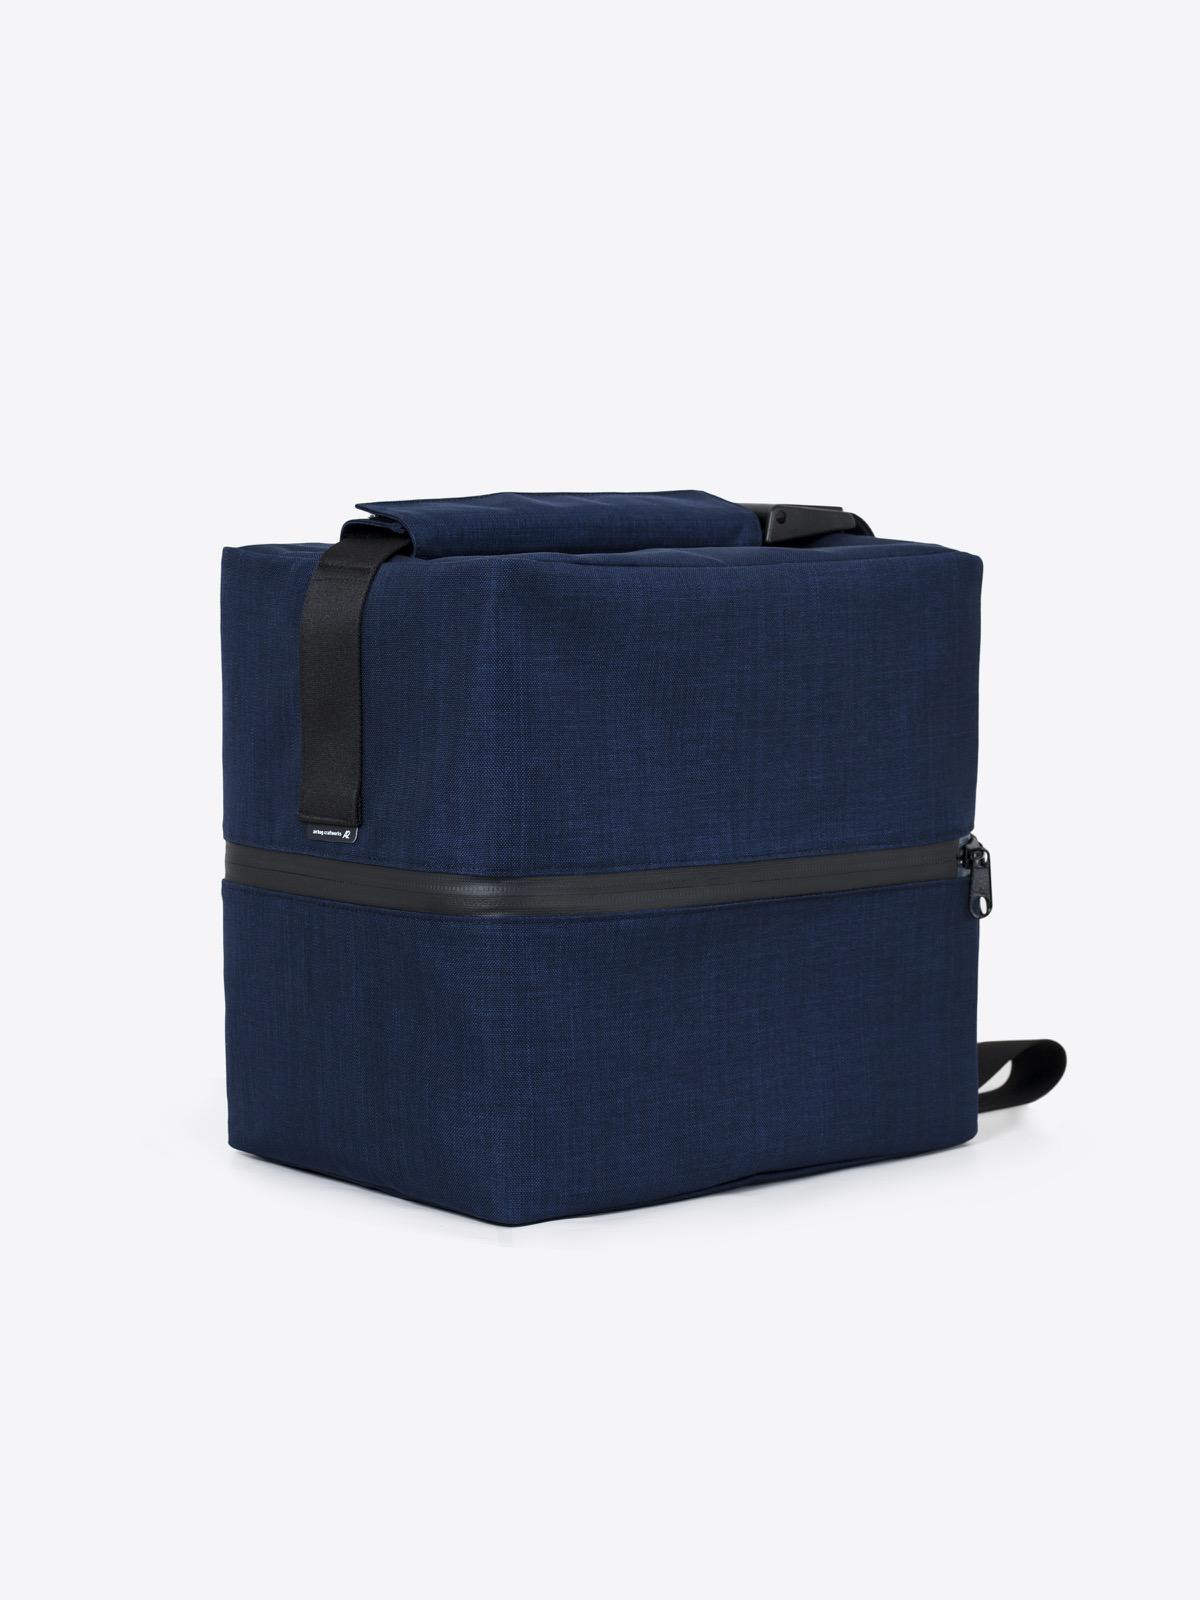 A2 nylon blue stealth edition